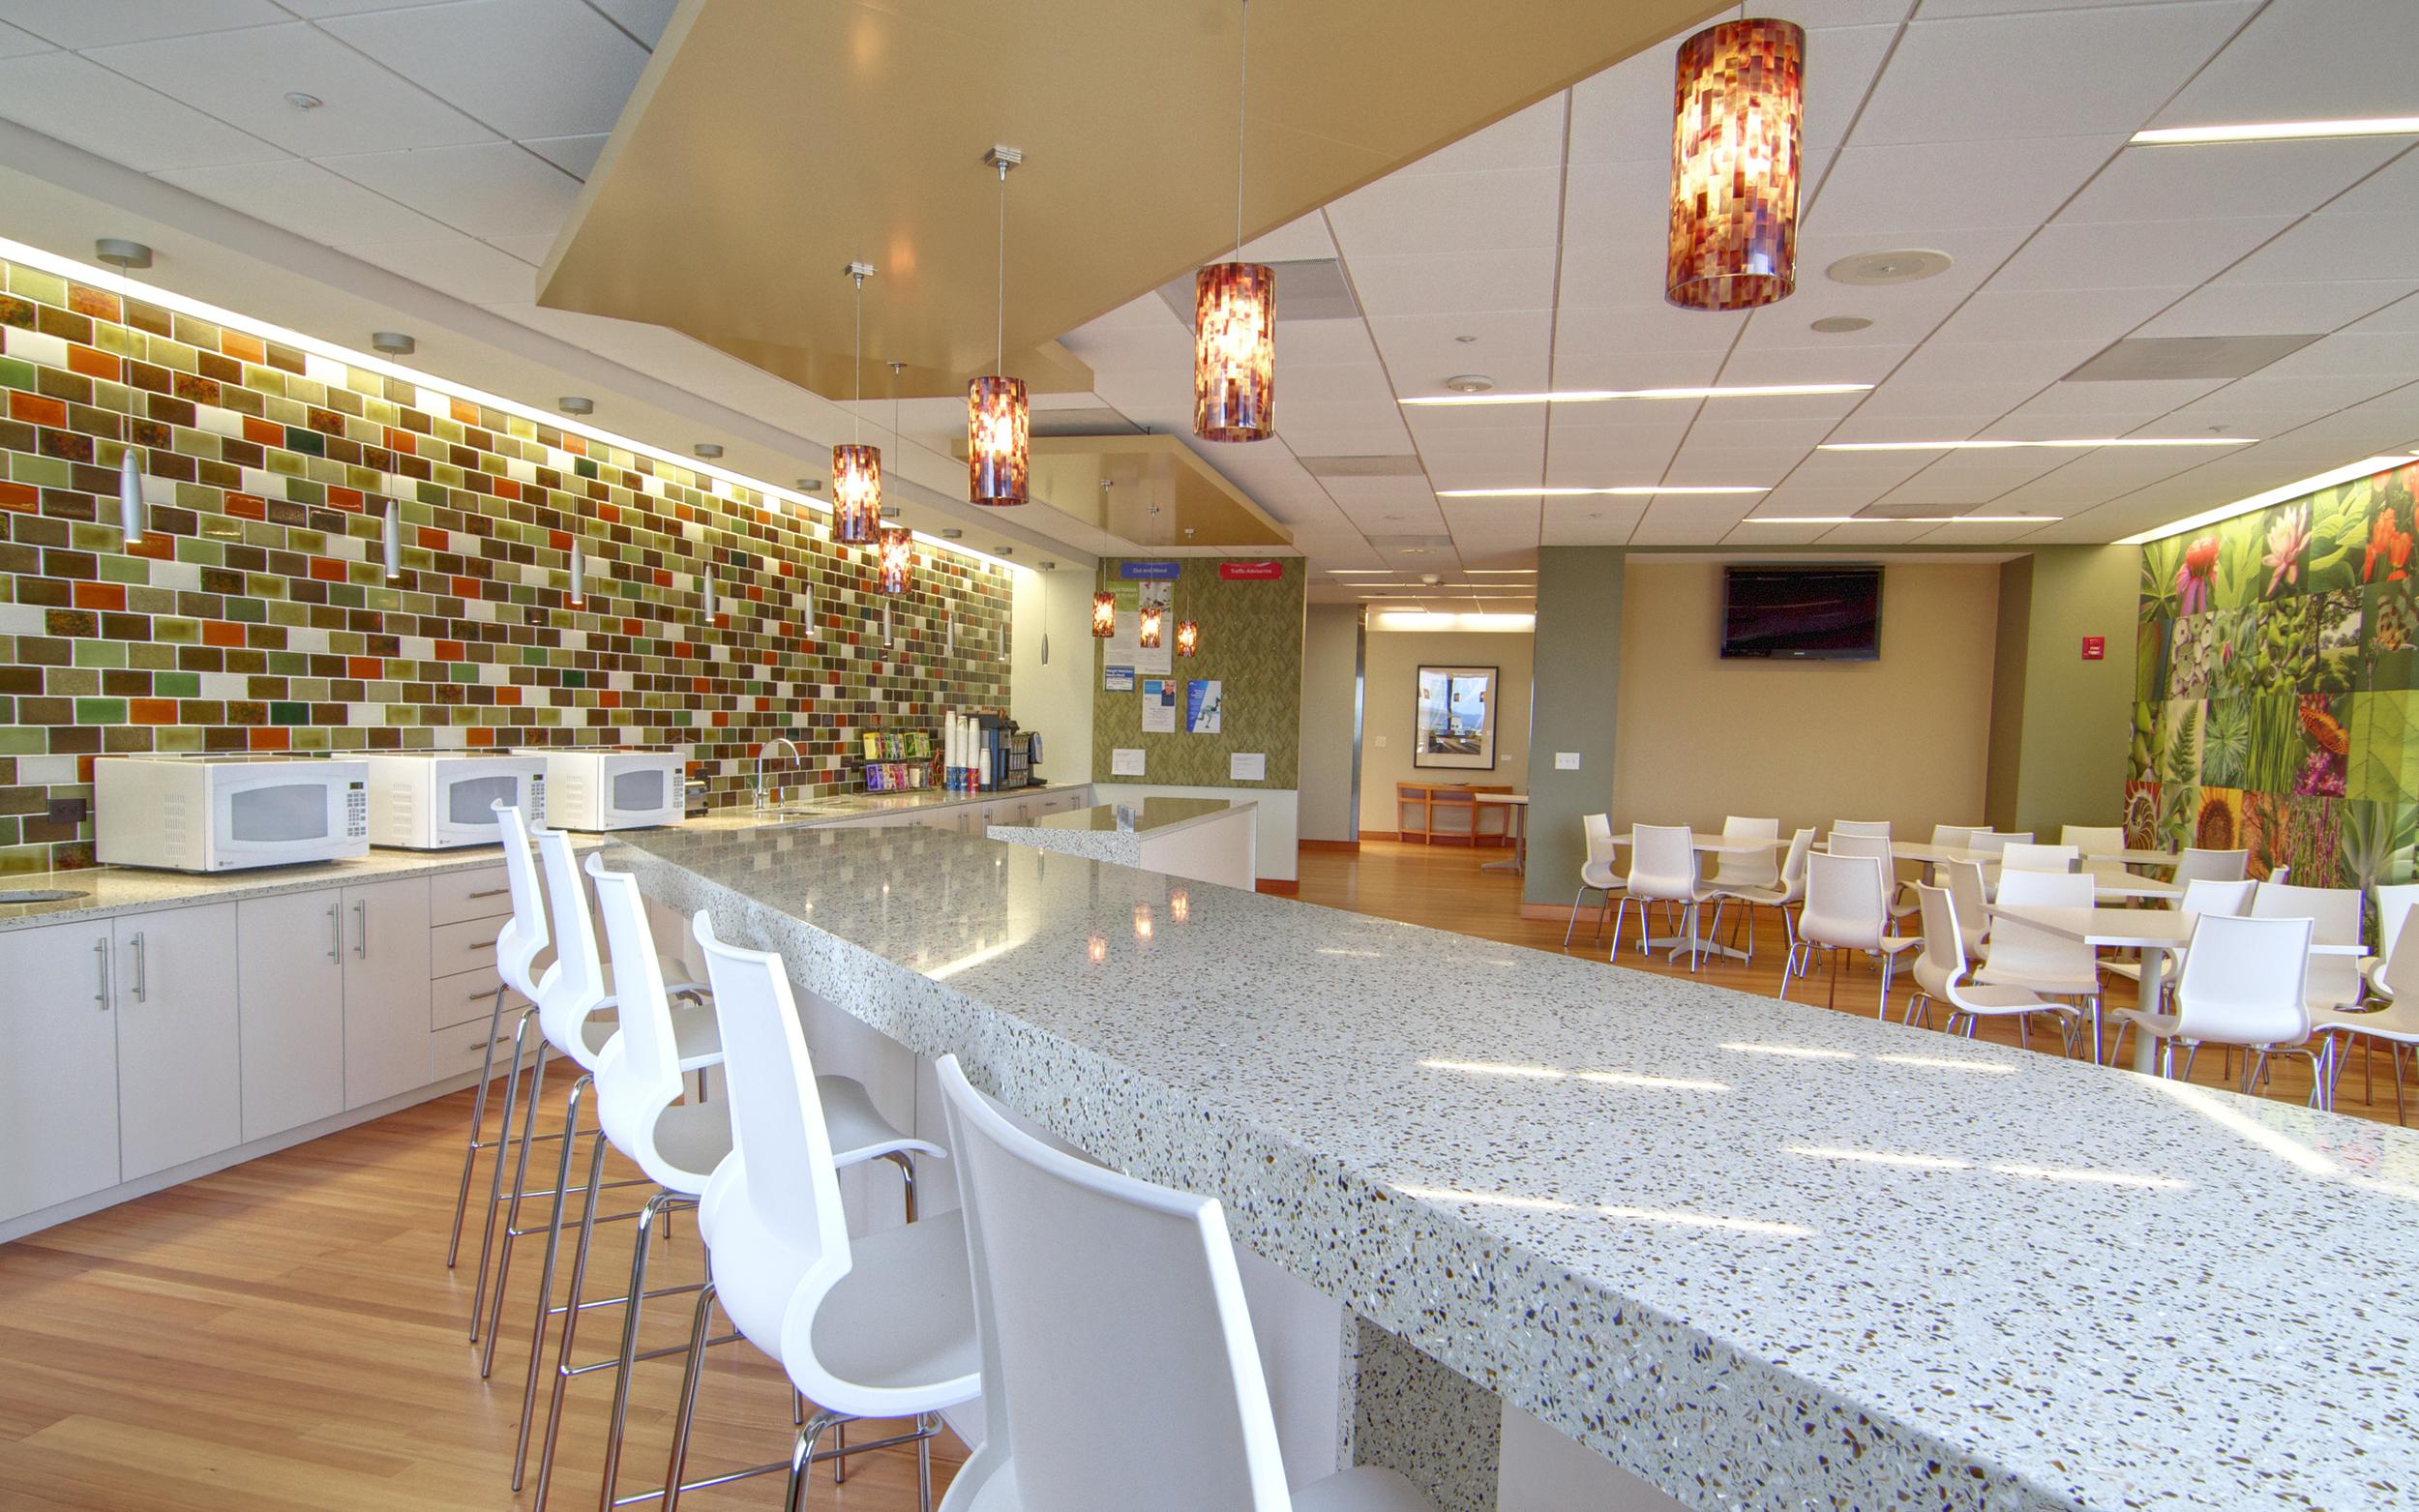 03 KPMG Tysons Lunch Room.jpg